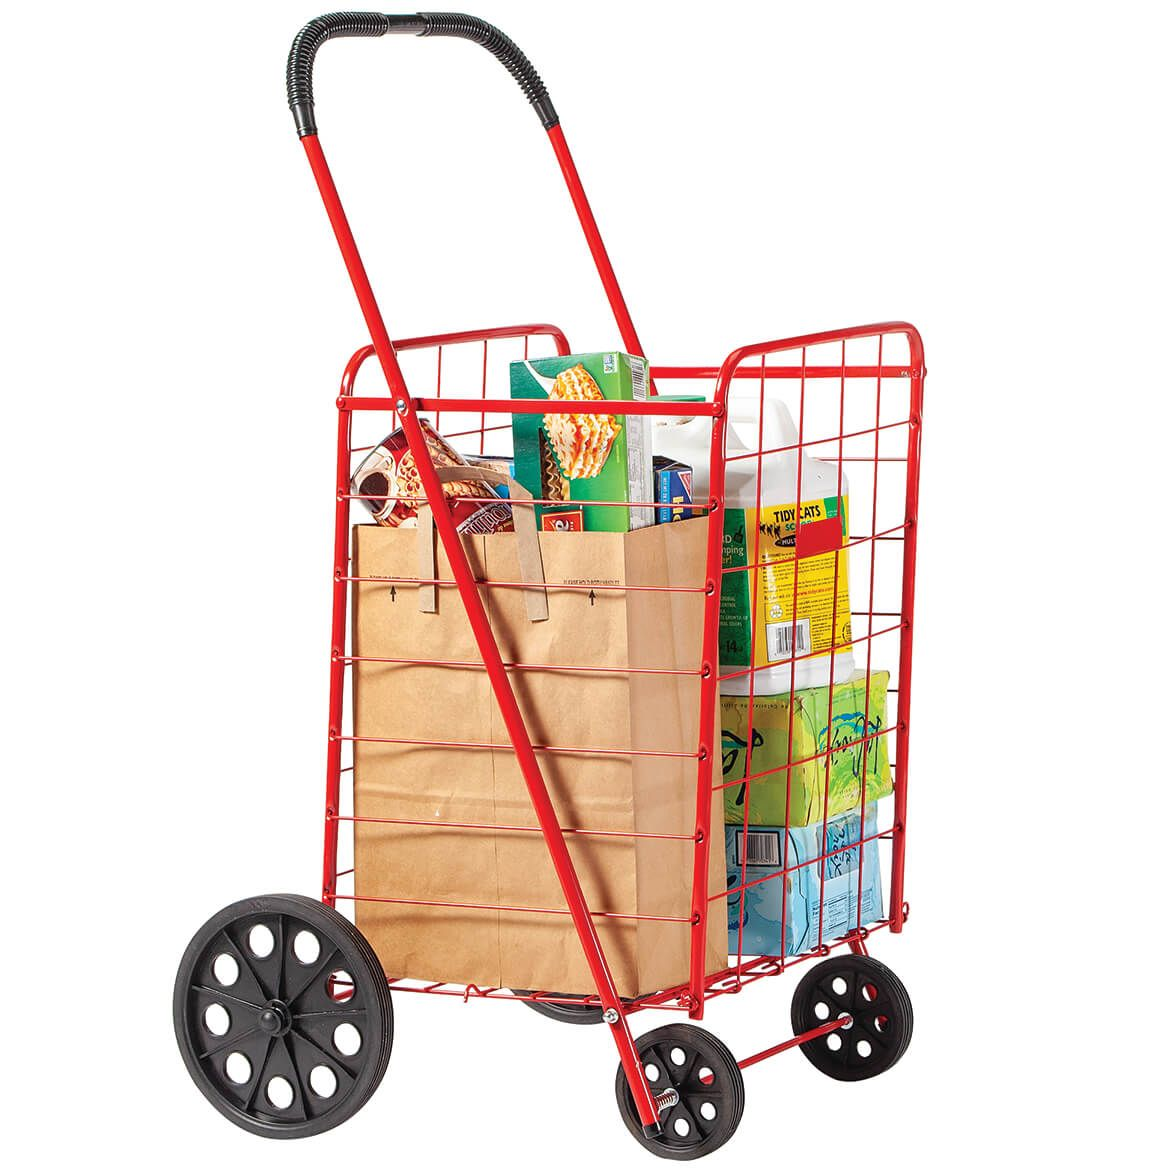 Deluxe Steel Shopping Cart                      XL-303496